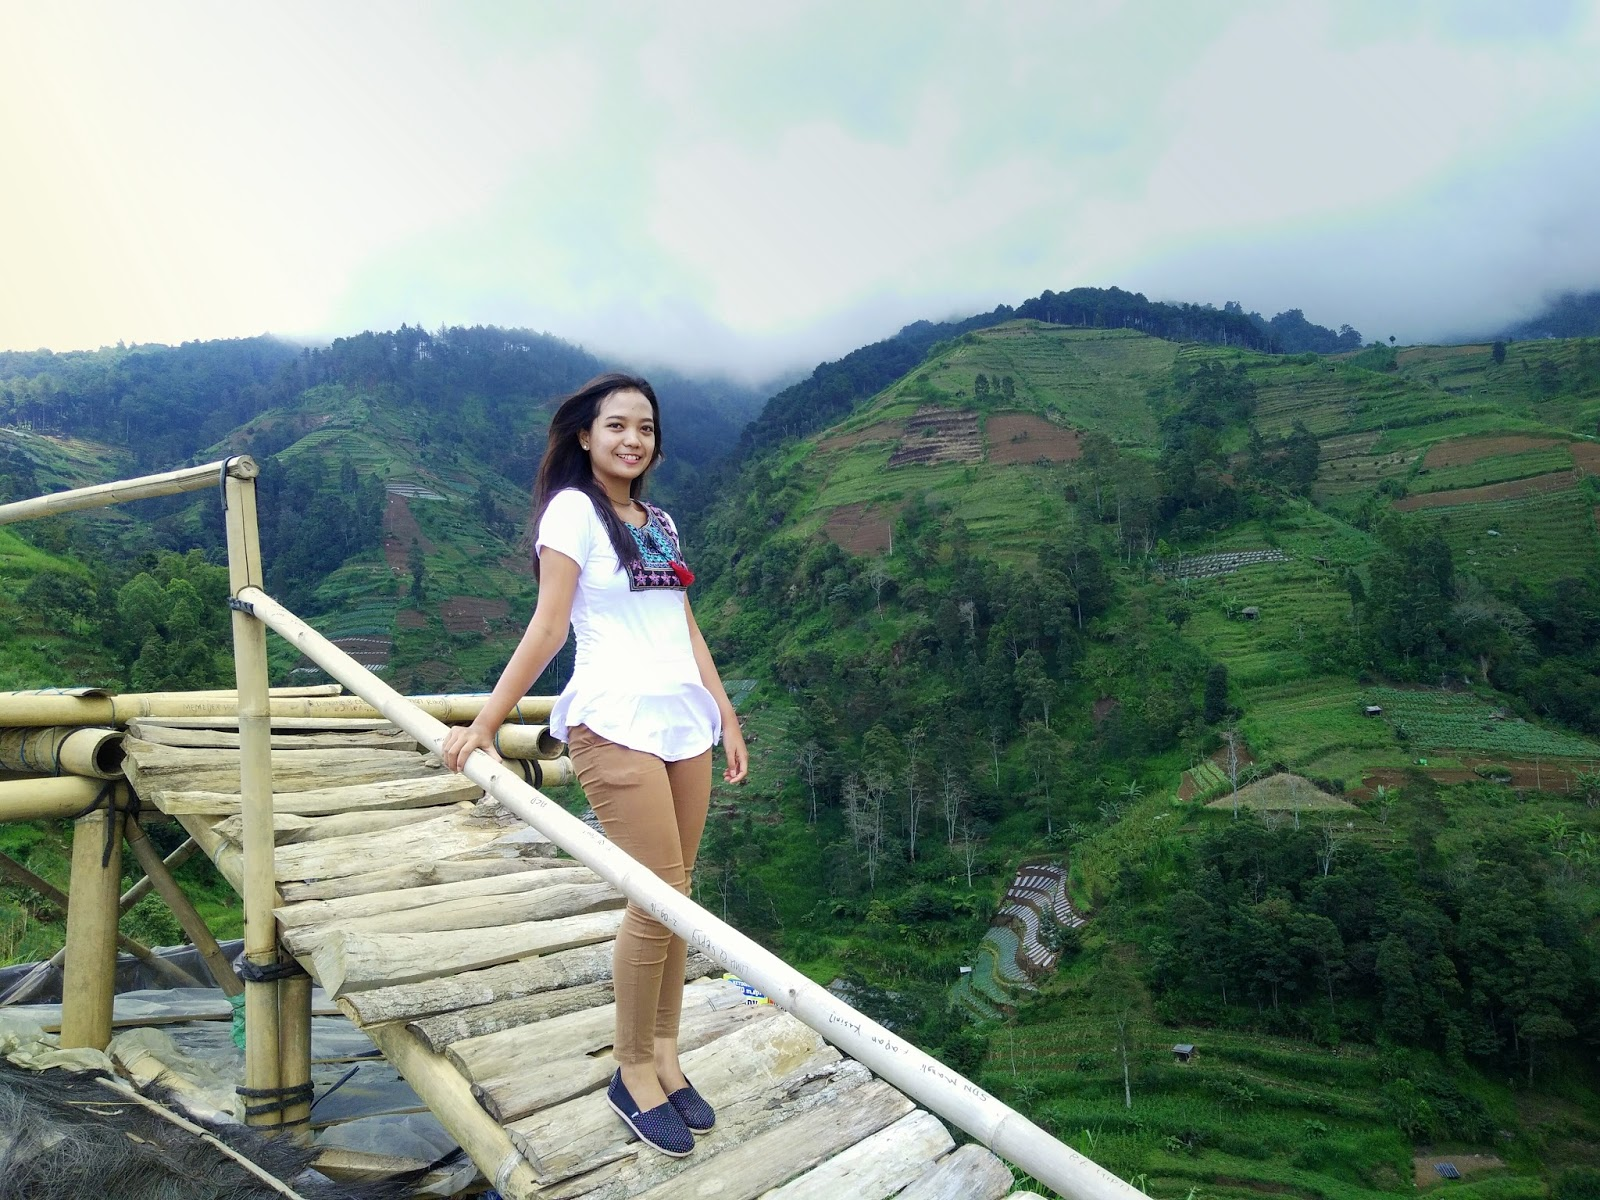 Sebuah Perjalanan Panjang Gardu Pandang Mangli Naah Foto Bisa Bikin